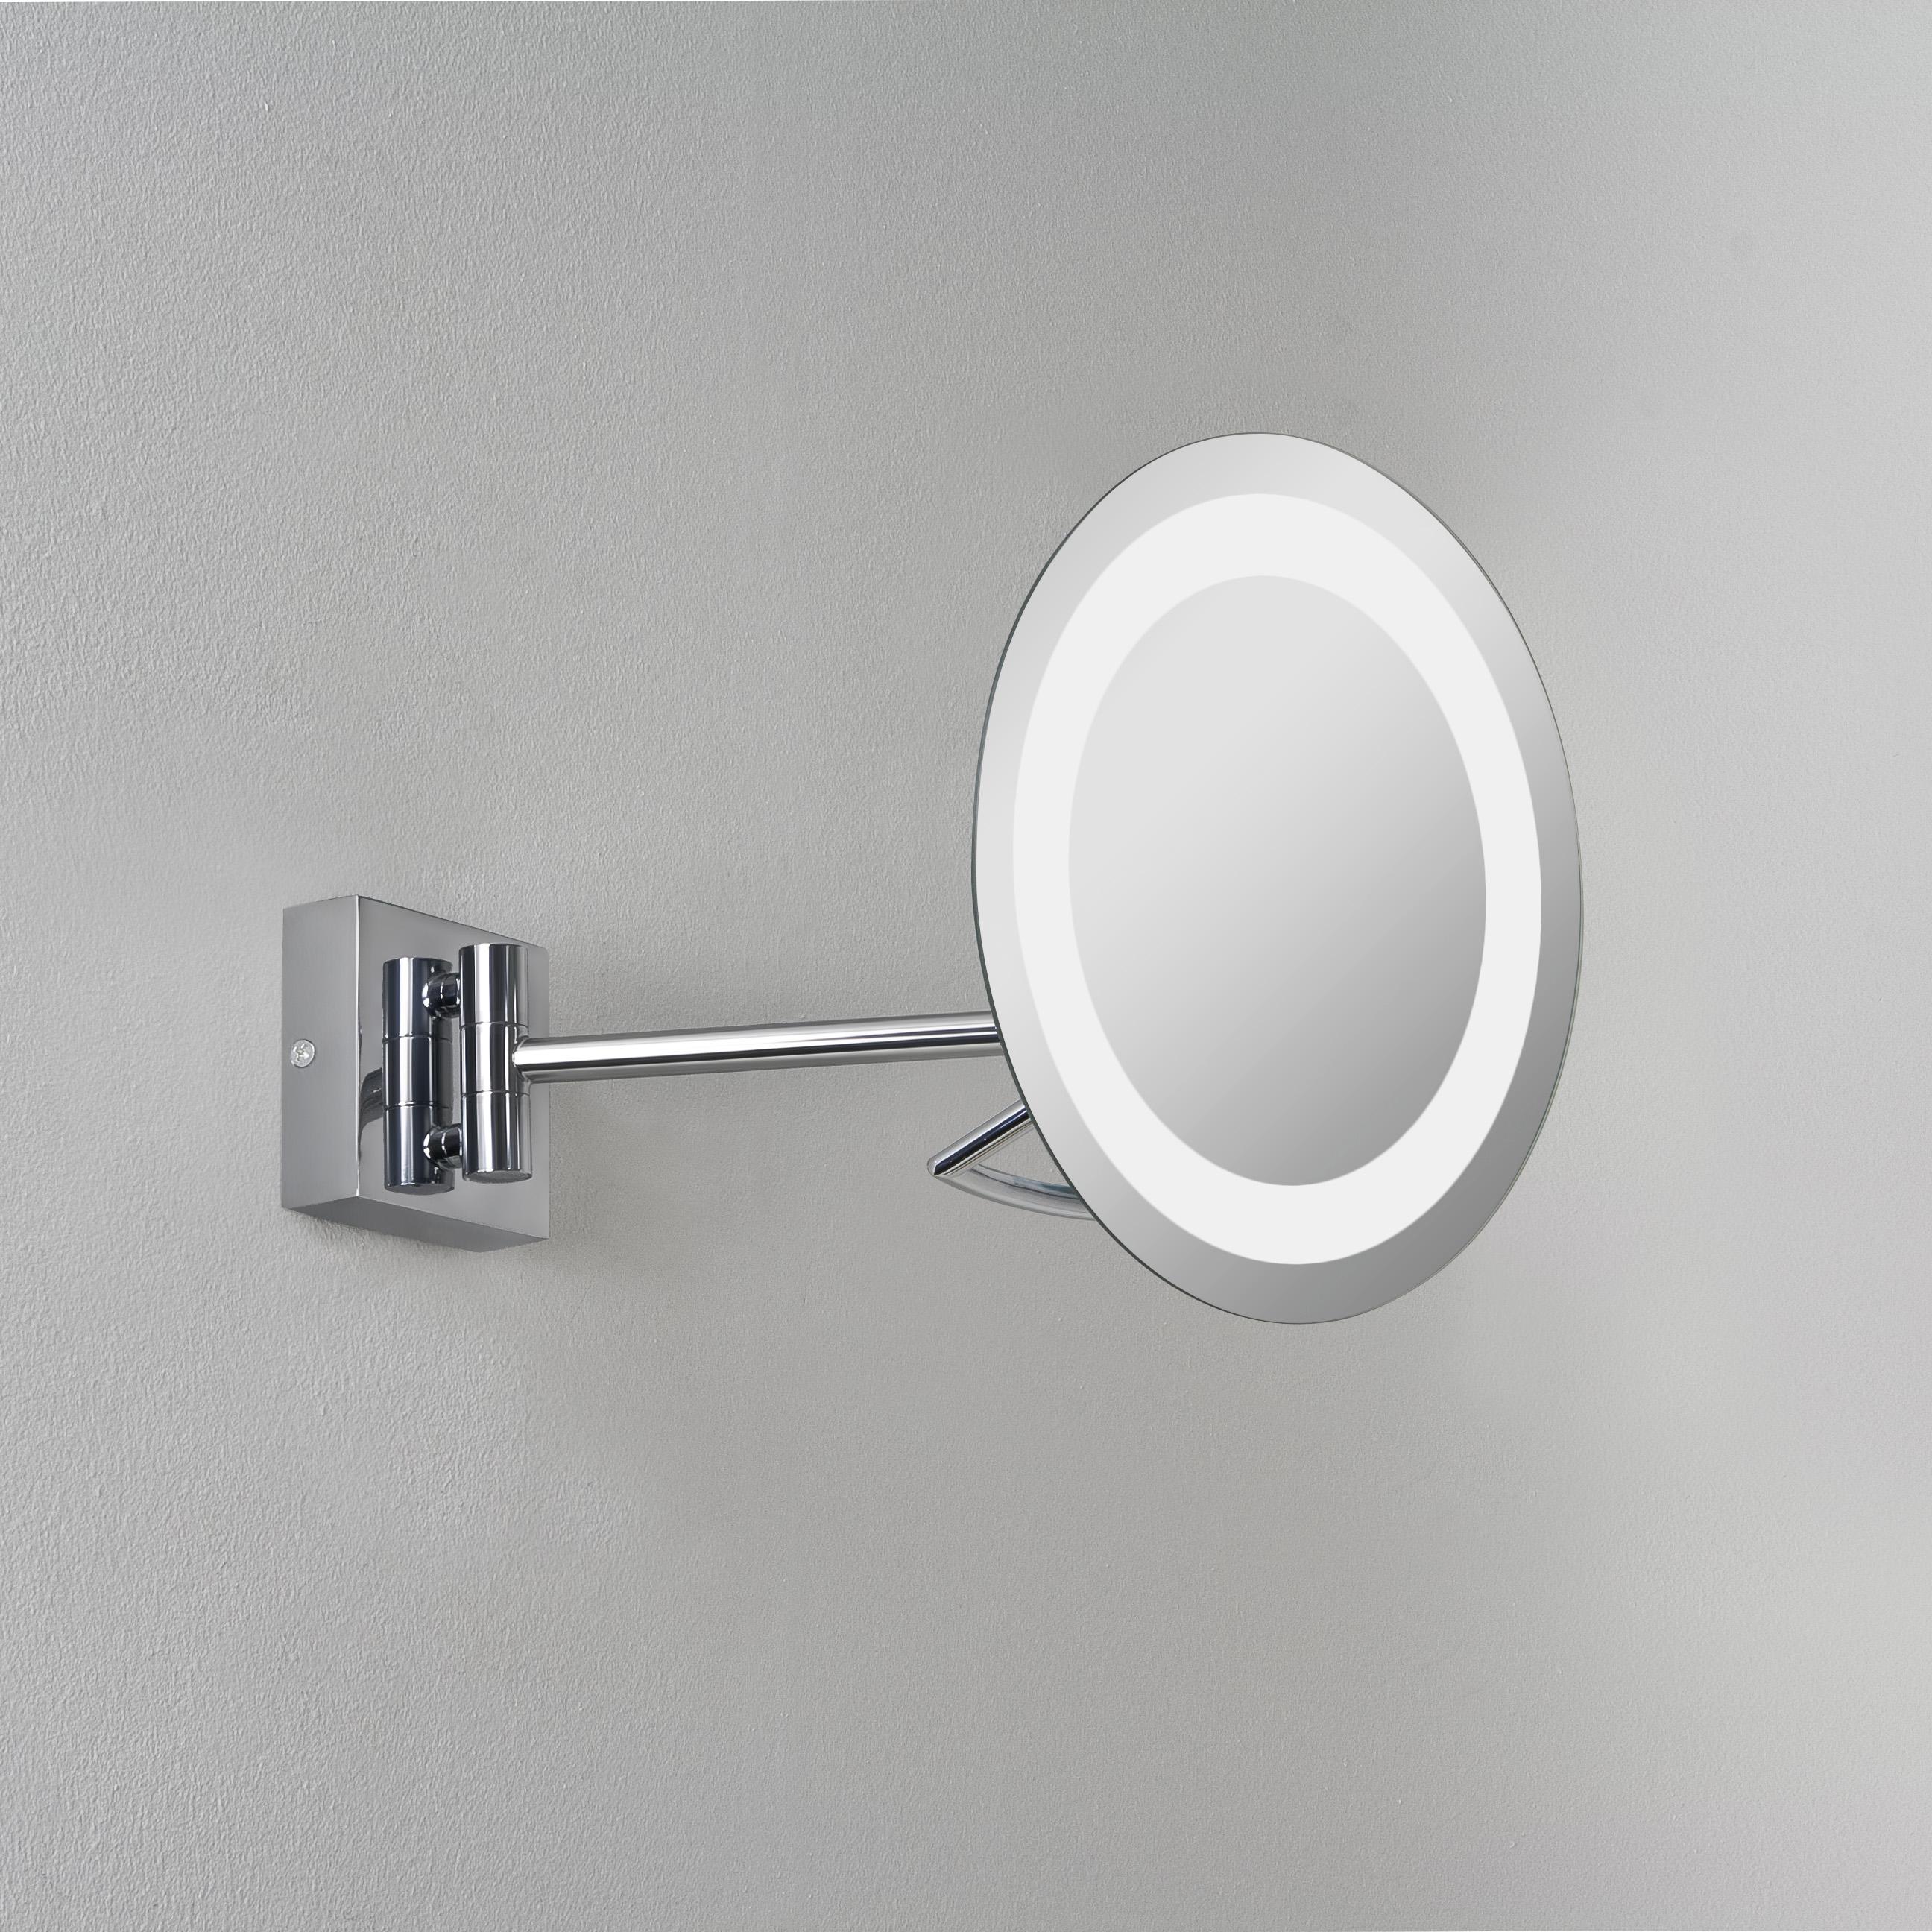 Astro 1097002 Gena Plus Mirror Light